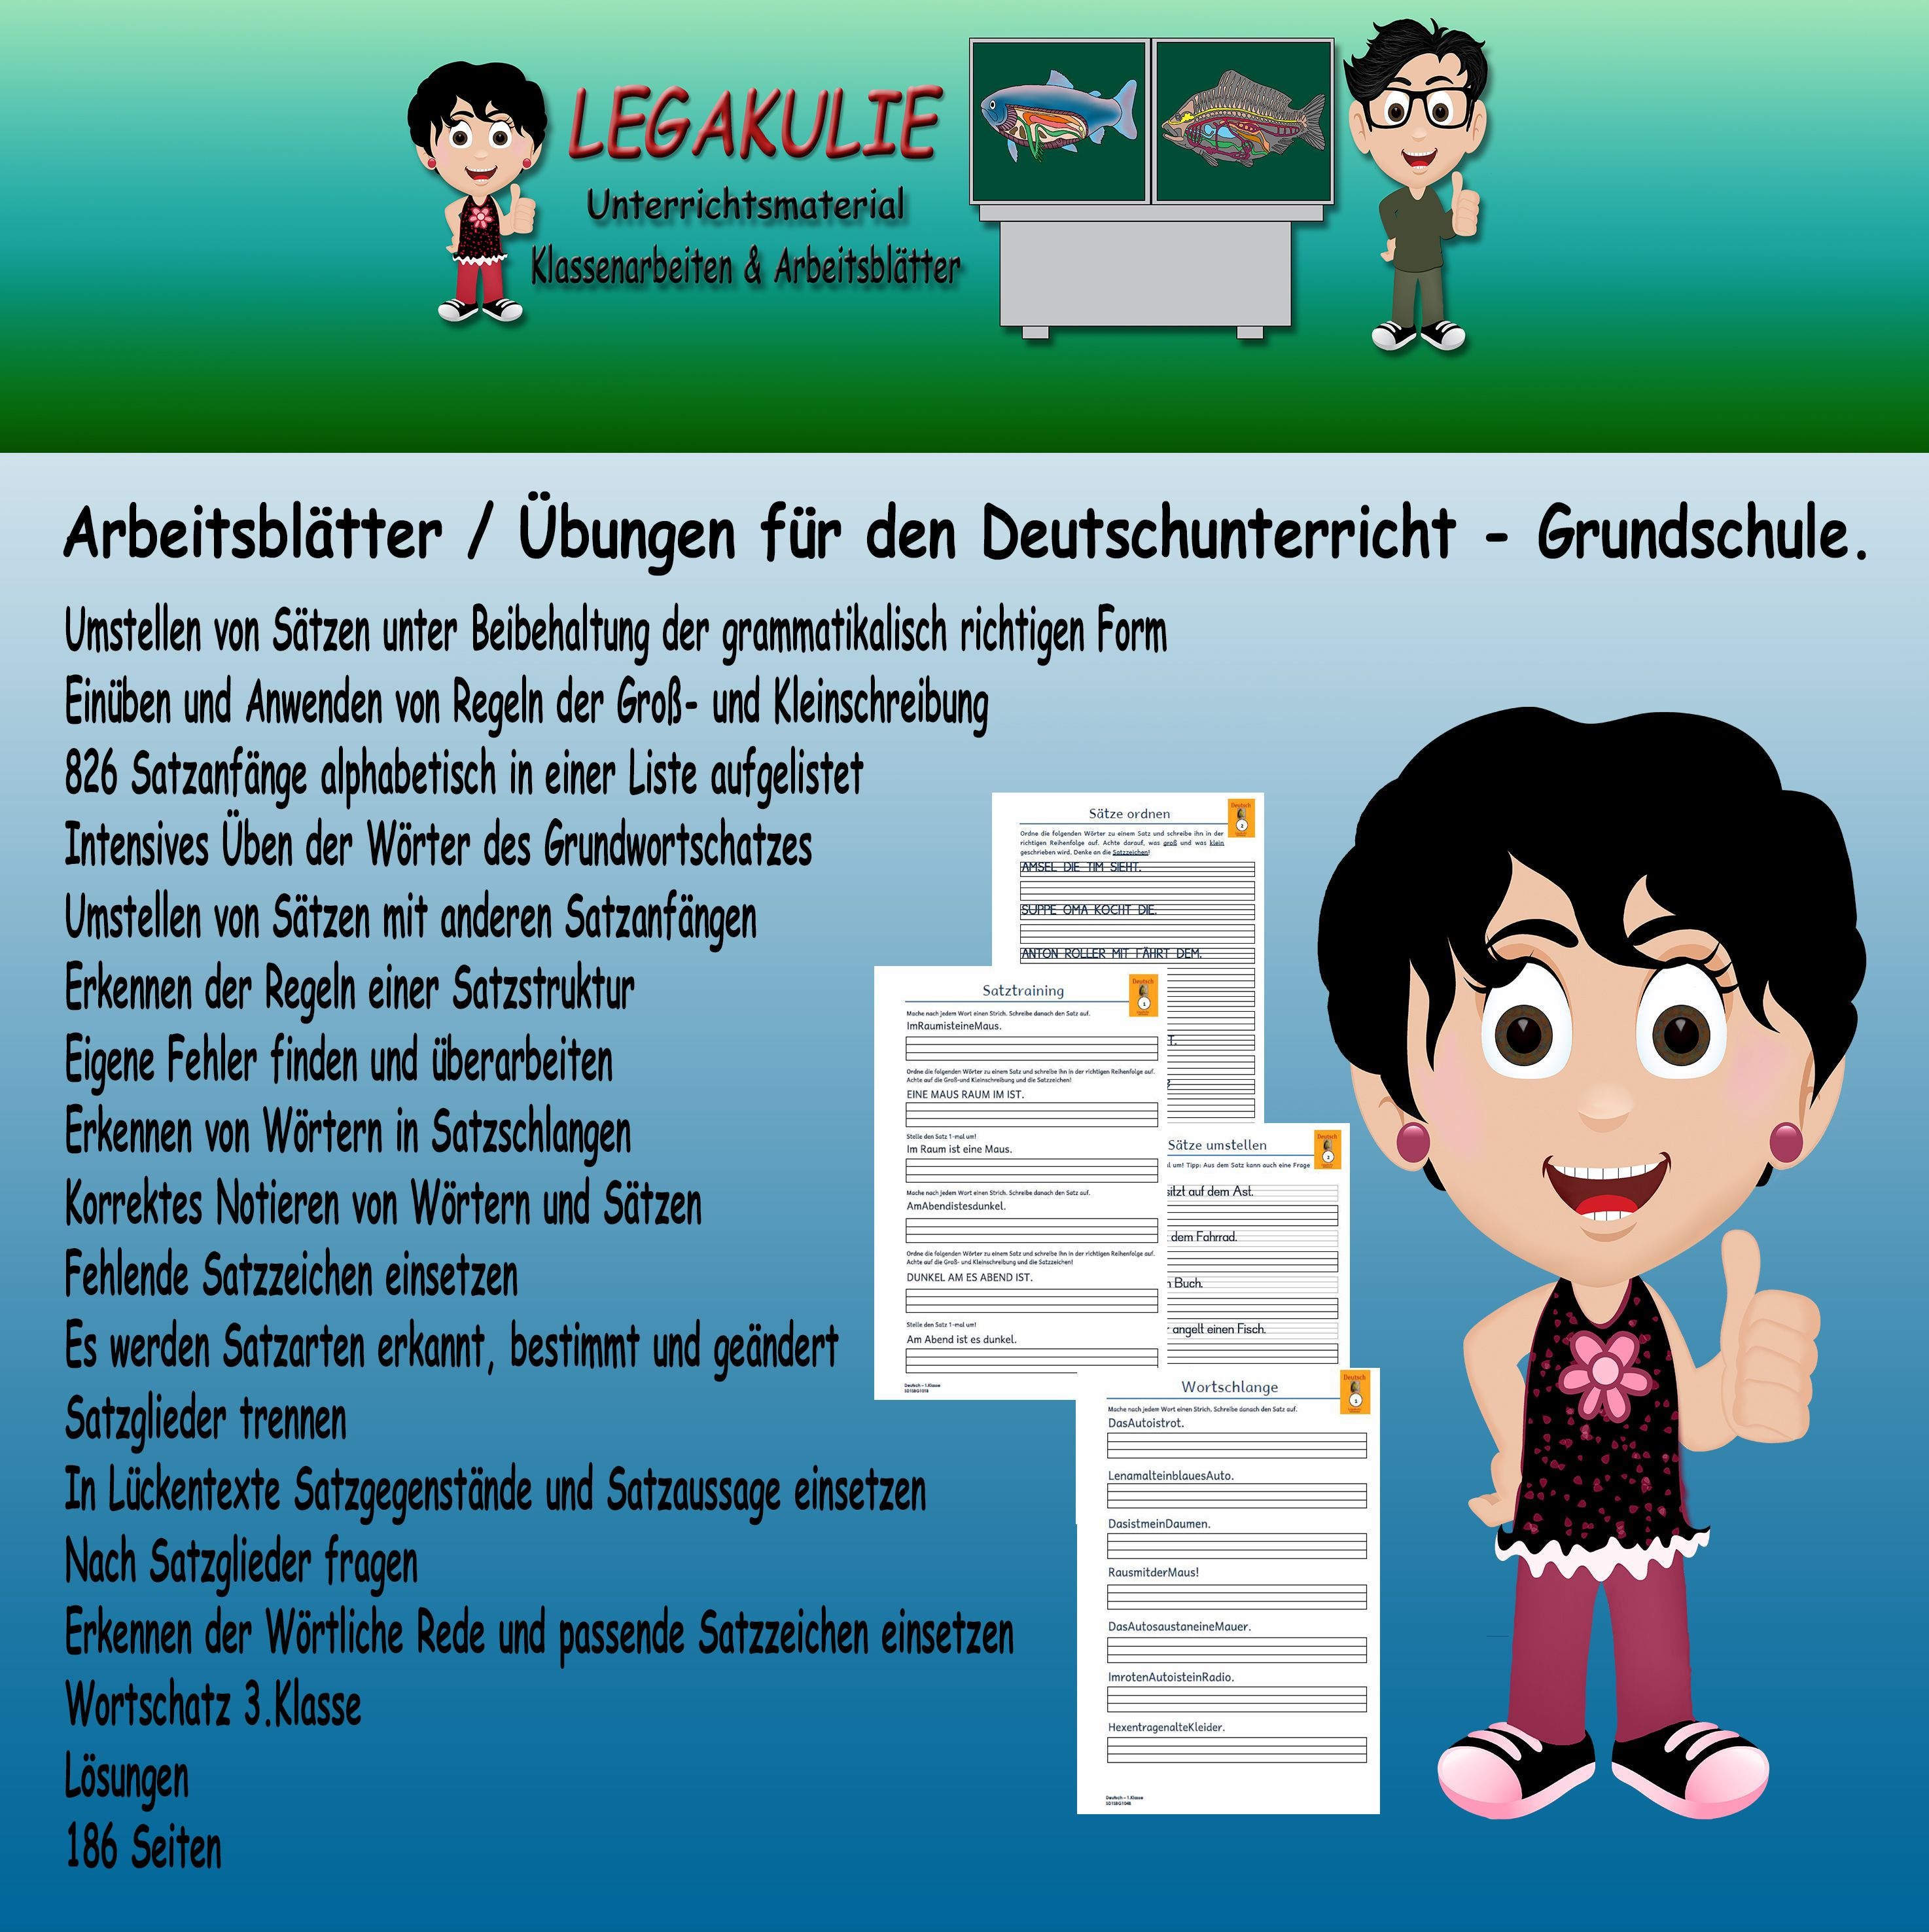 3.Klasse Satzbau Satzgestaltung | Pinterest | Satzbau ...